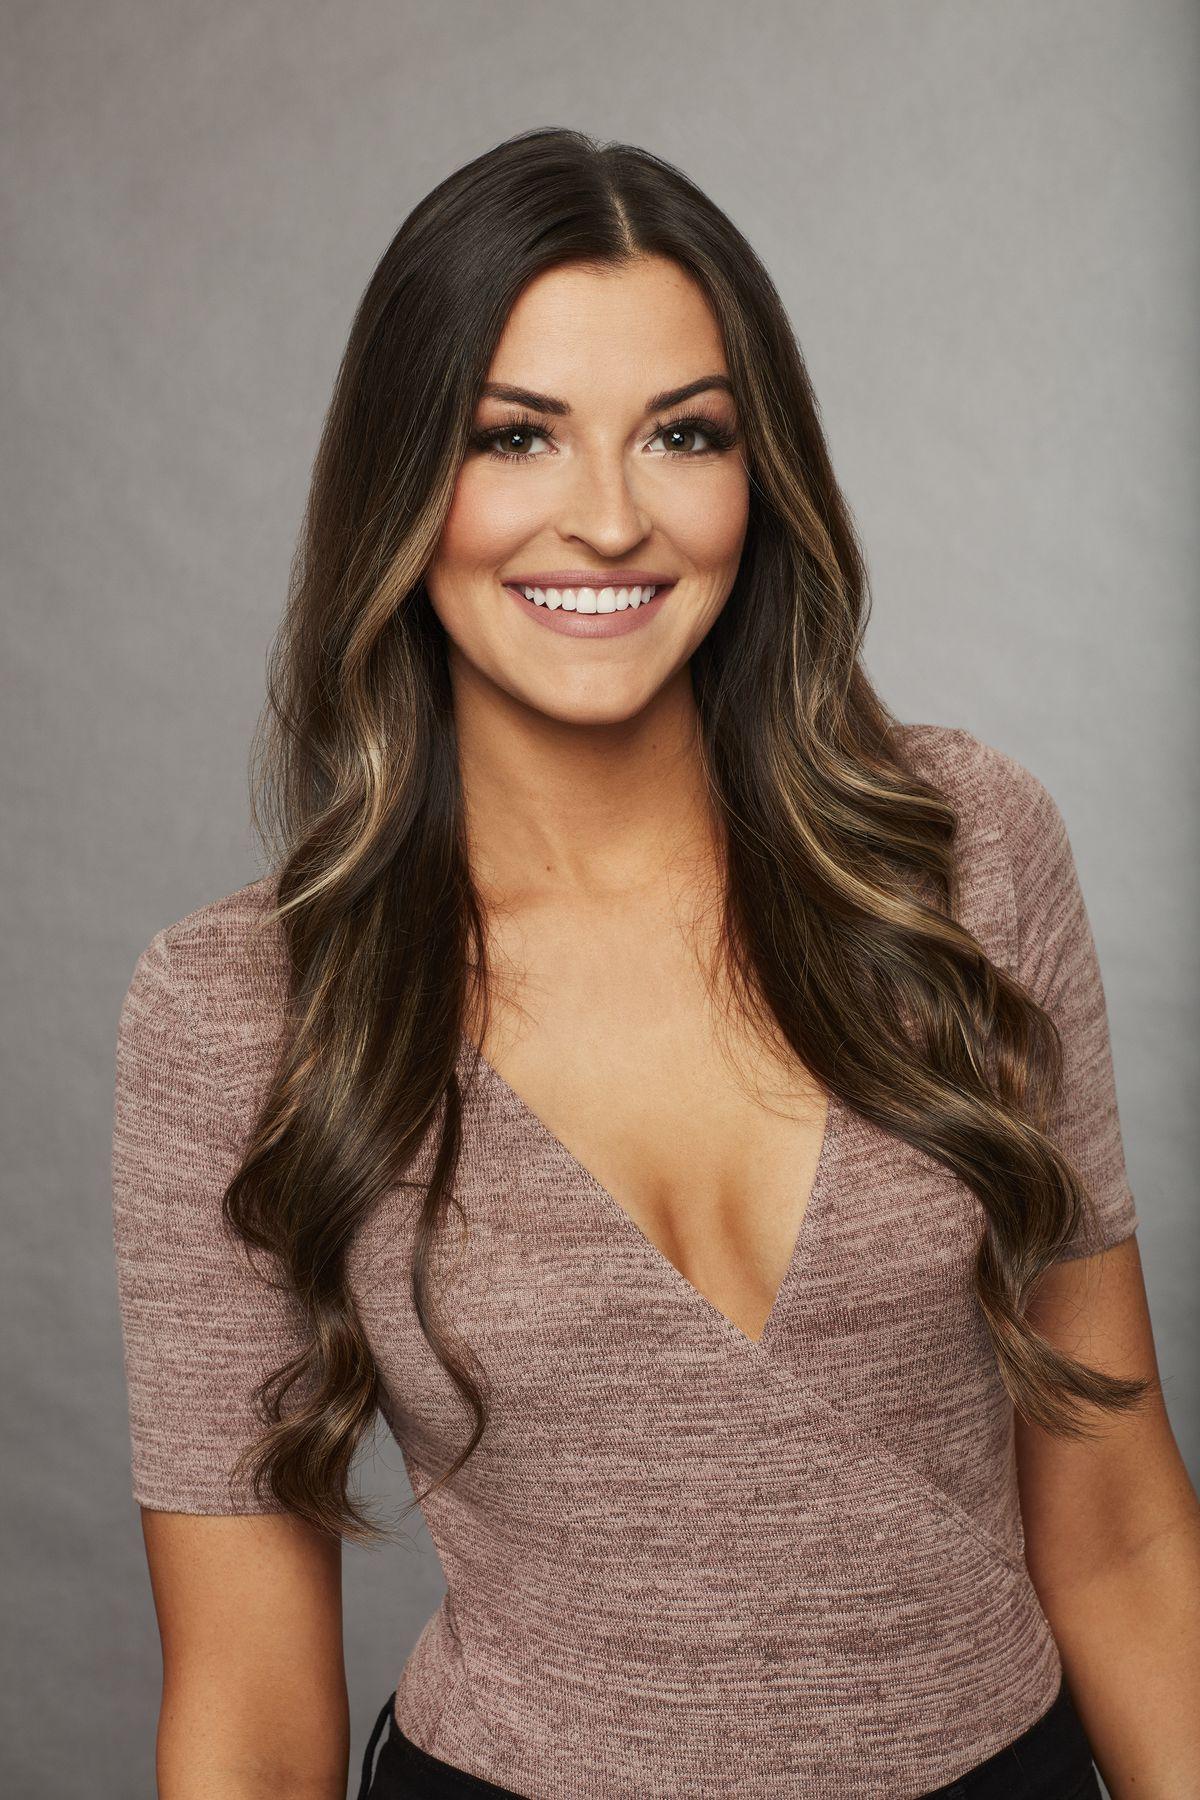 Bachelor contestant Tia, 26